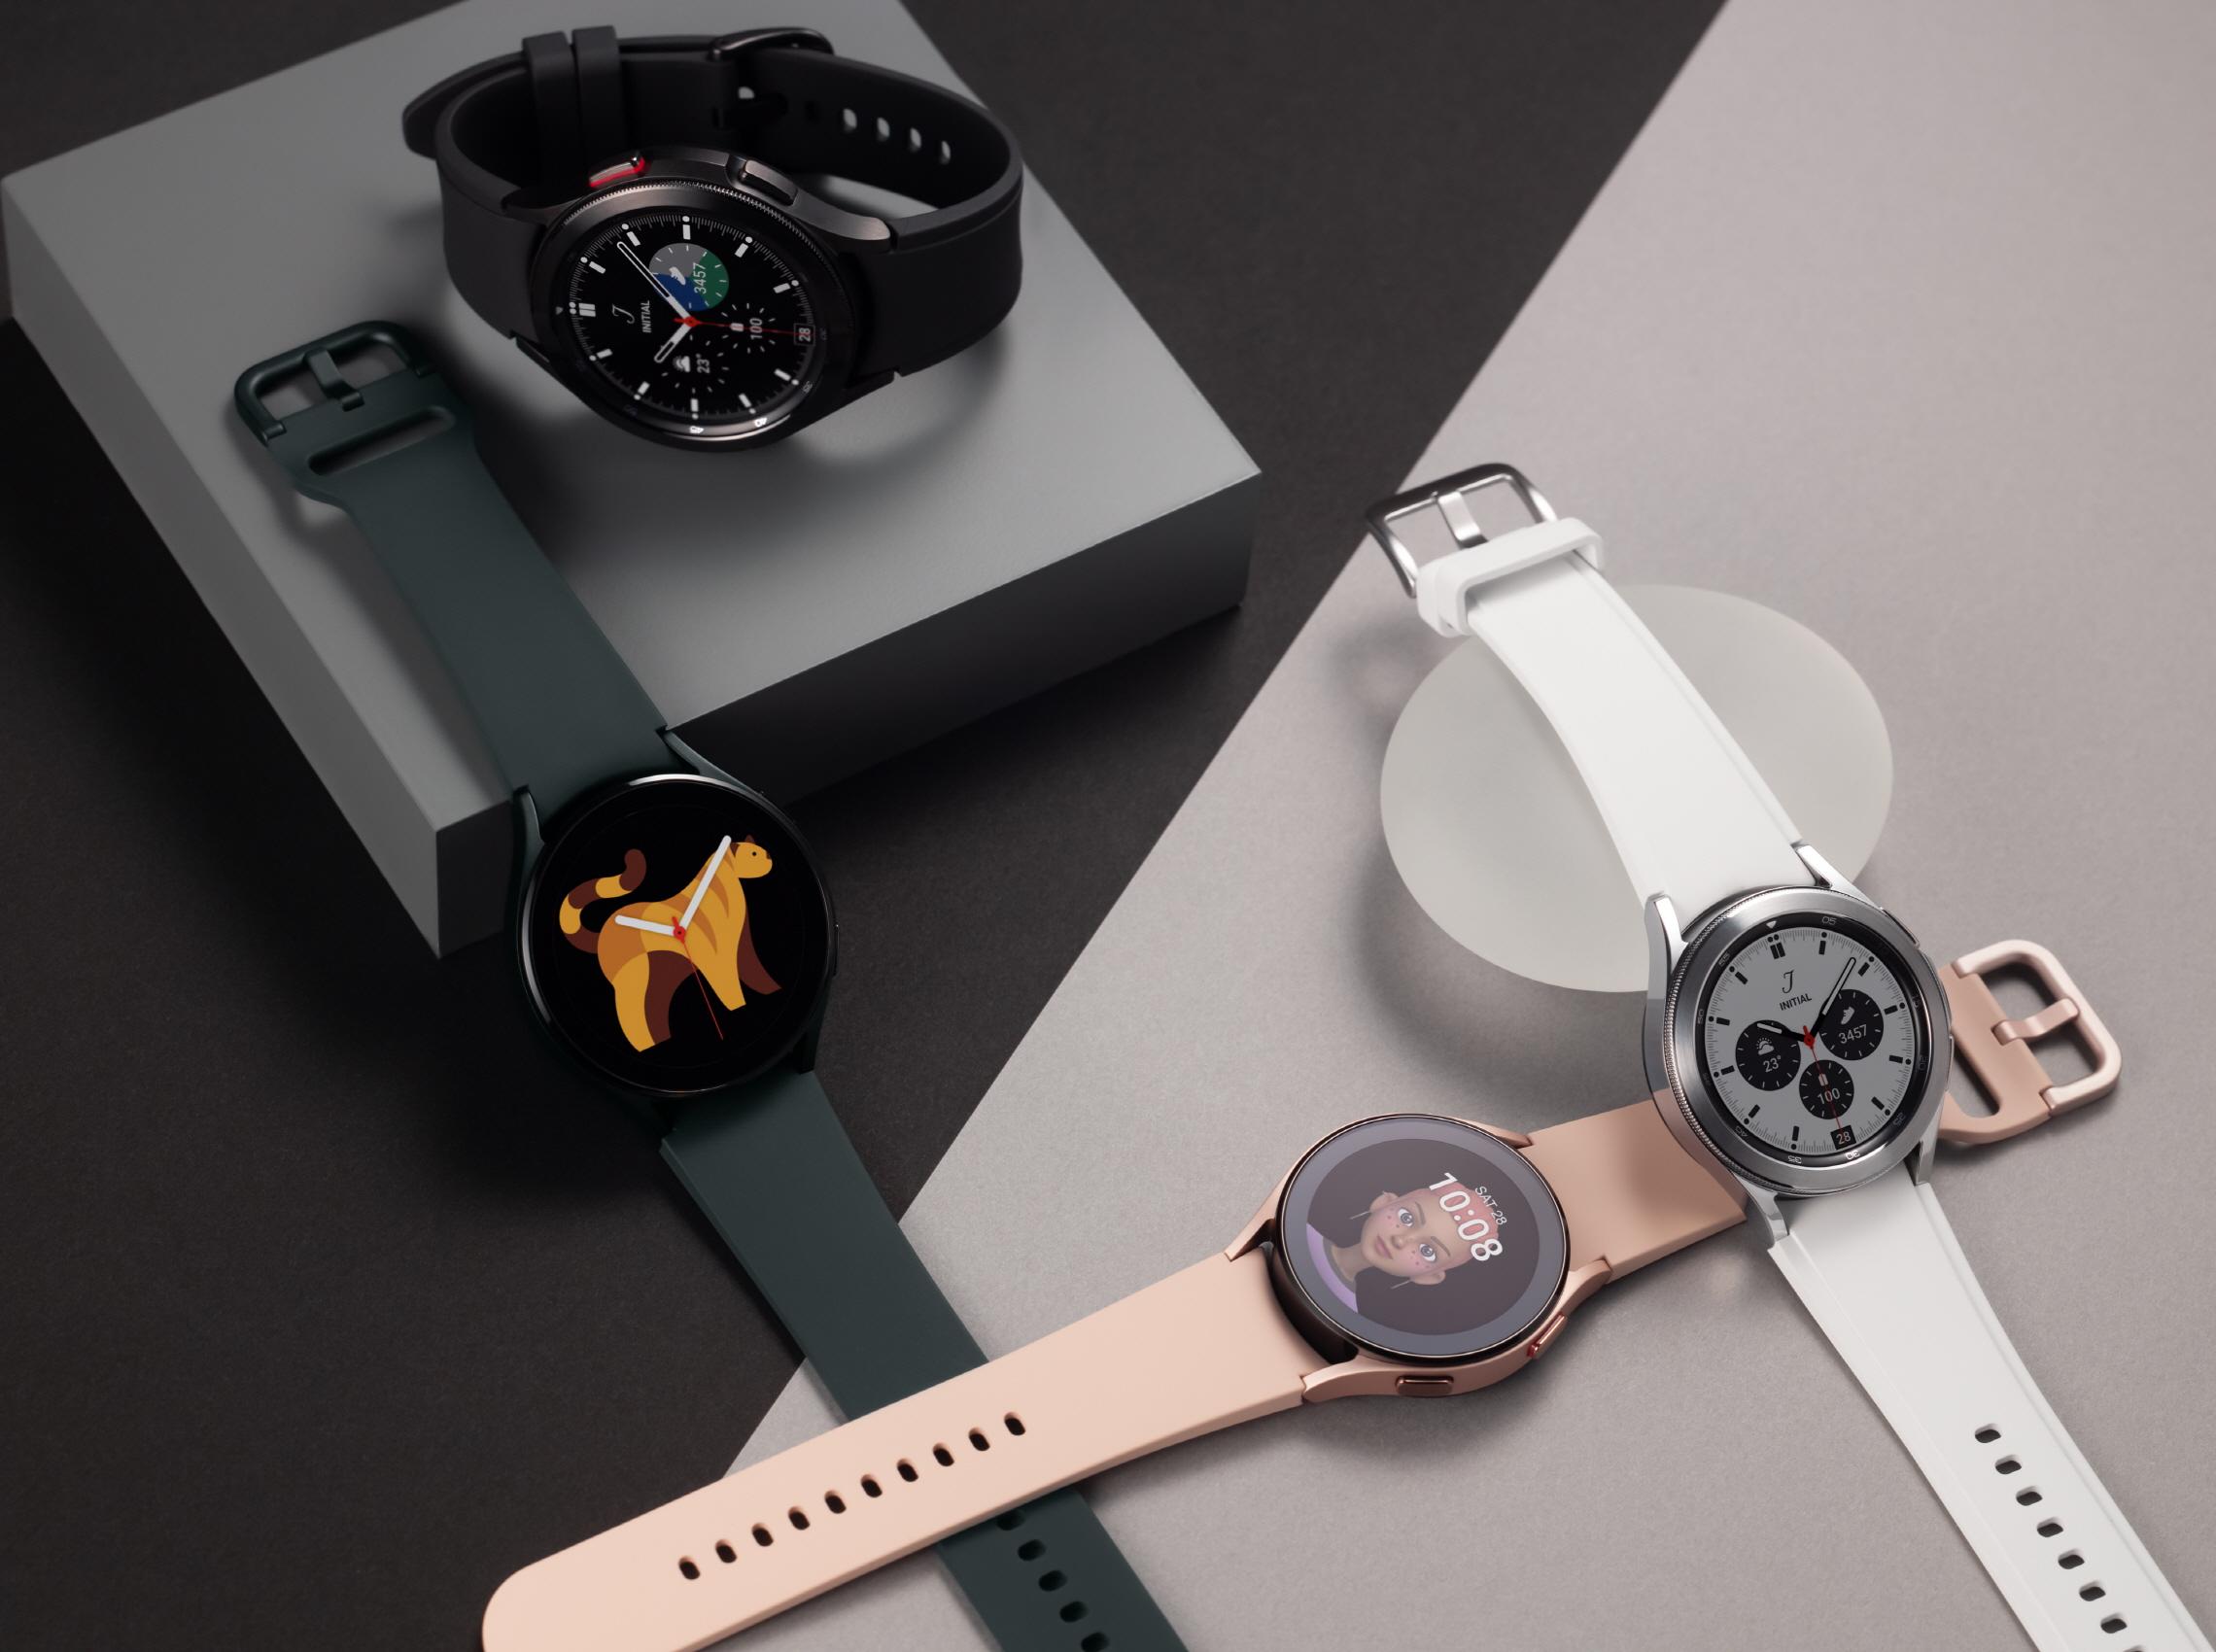 2._Galaxy_Watch4_Product_Series2.jpg